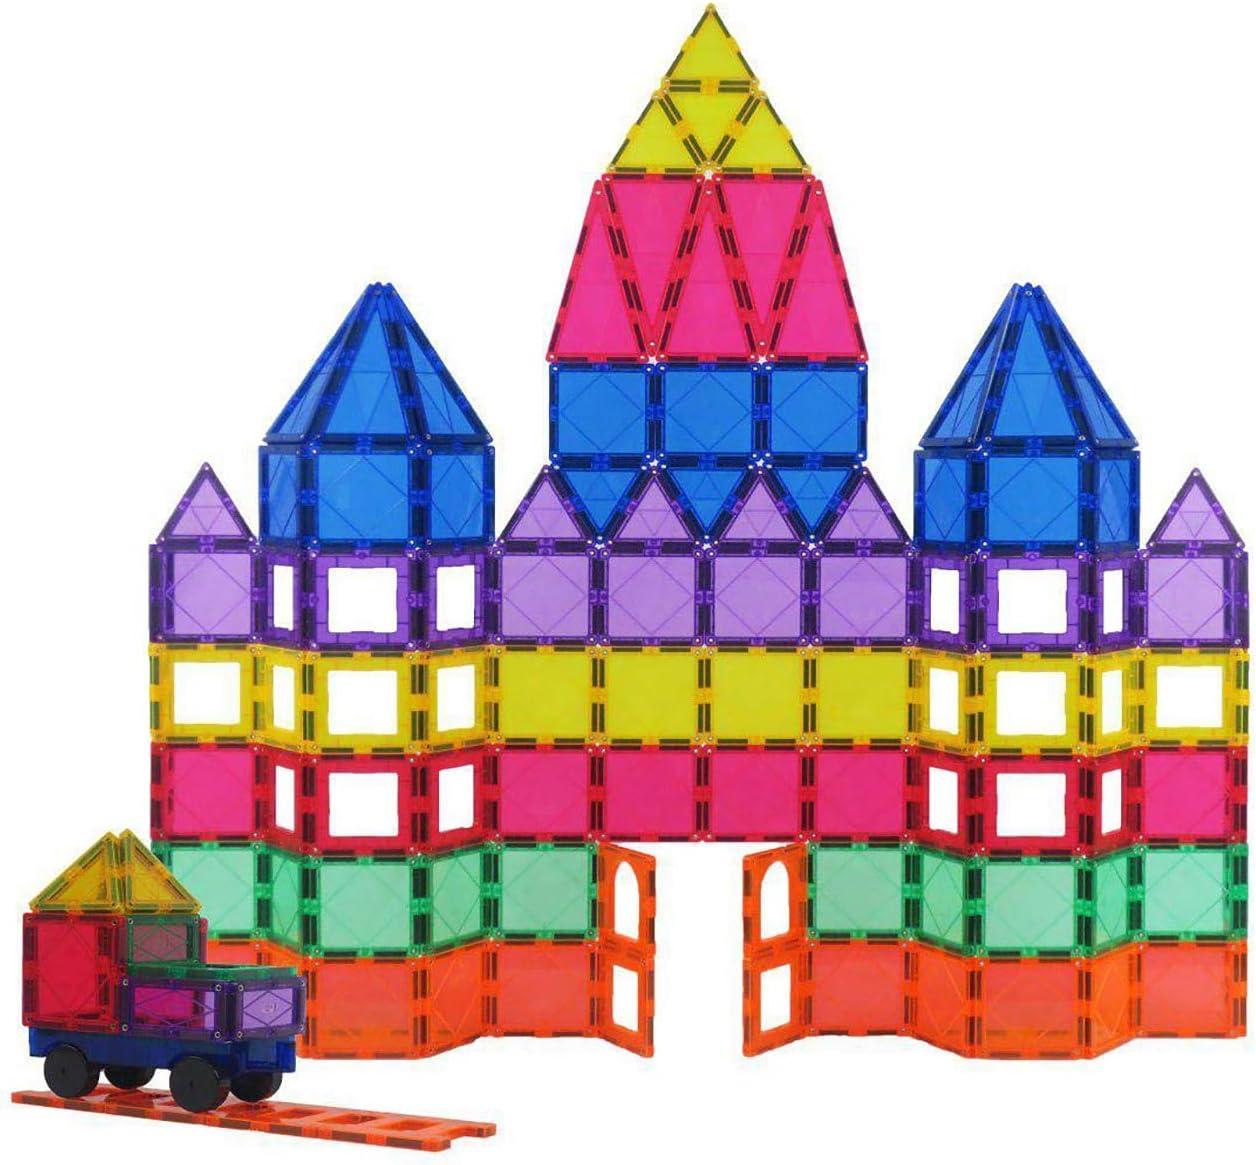 Box Magnetic Blocks 30 Piece Set Magnetic Building Construction Toy Big Large Block